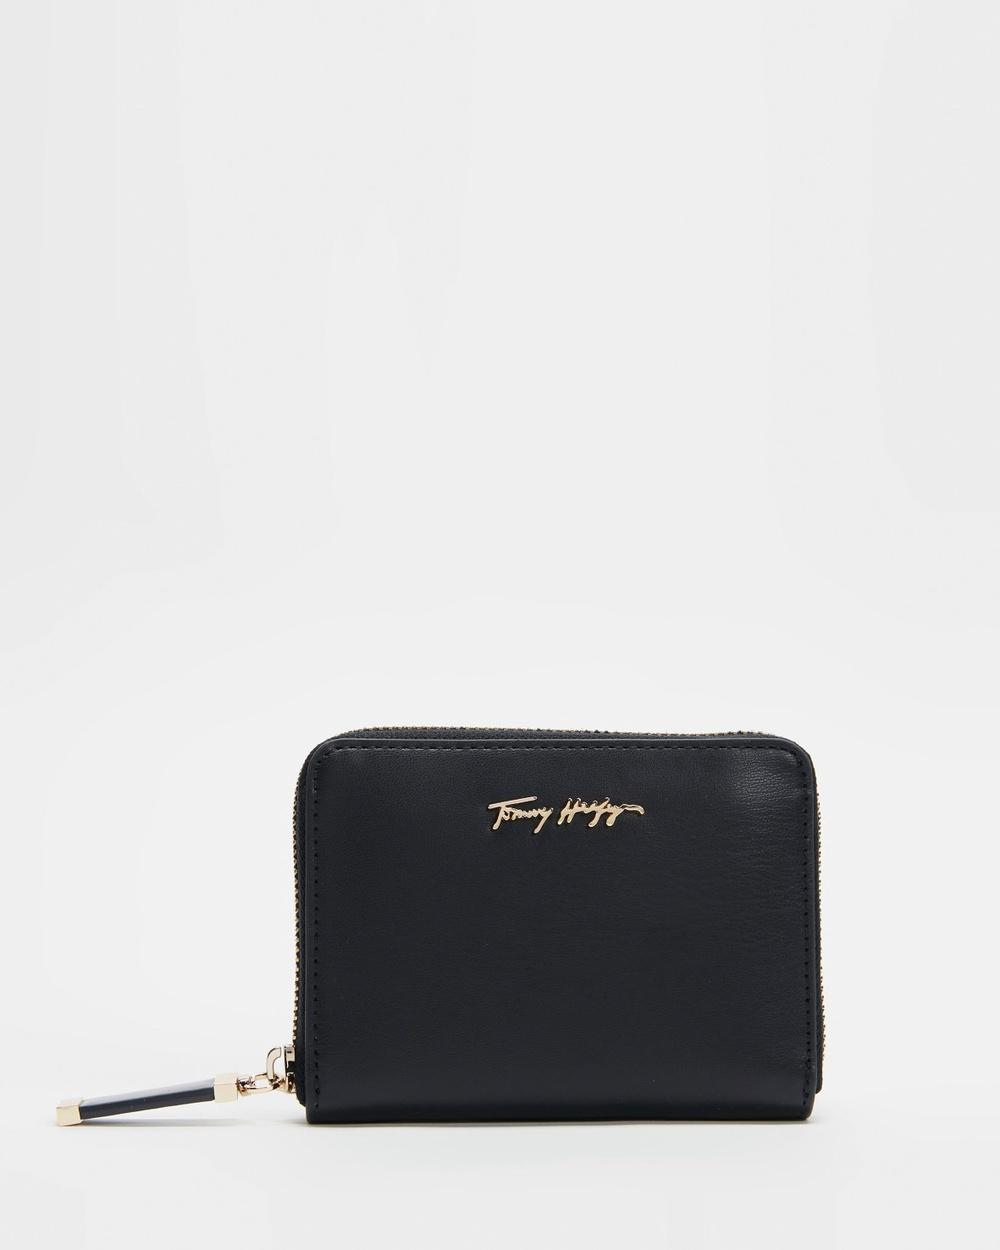 Tommy Hilfiger Iconic Medium Wallet Wallets Desert Sky